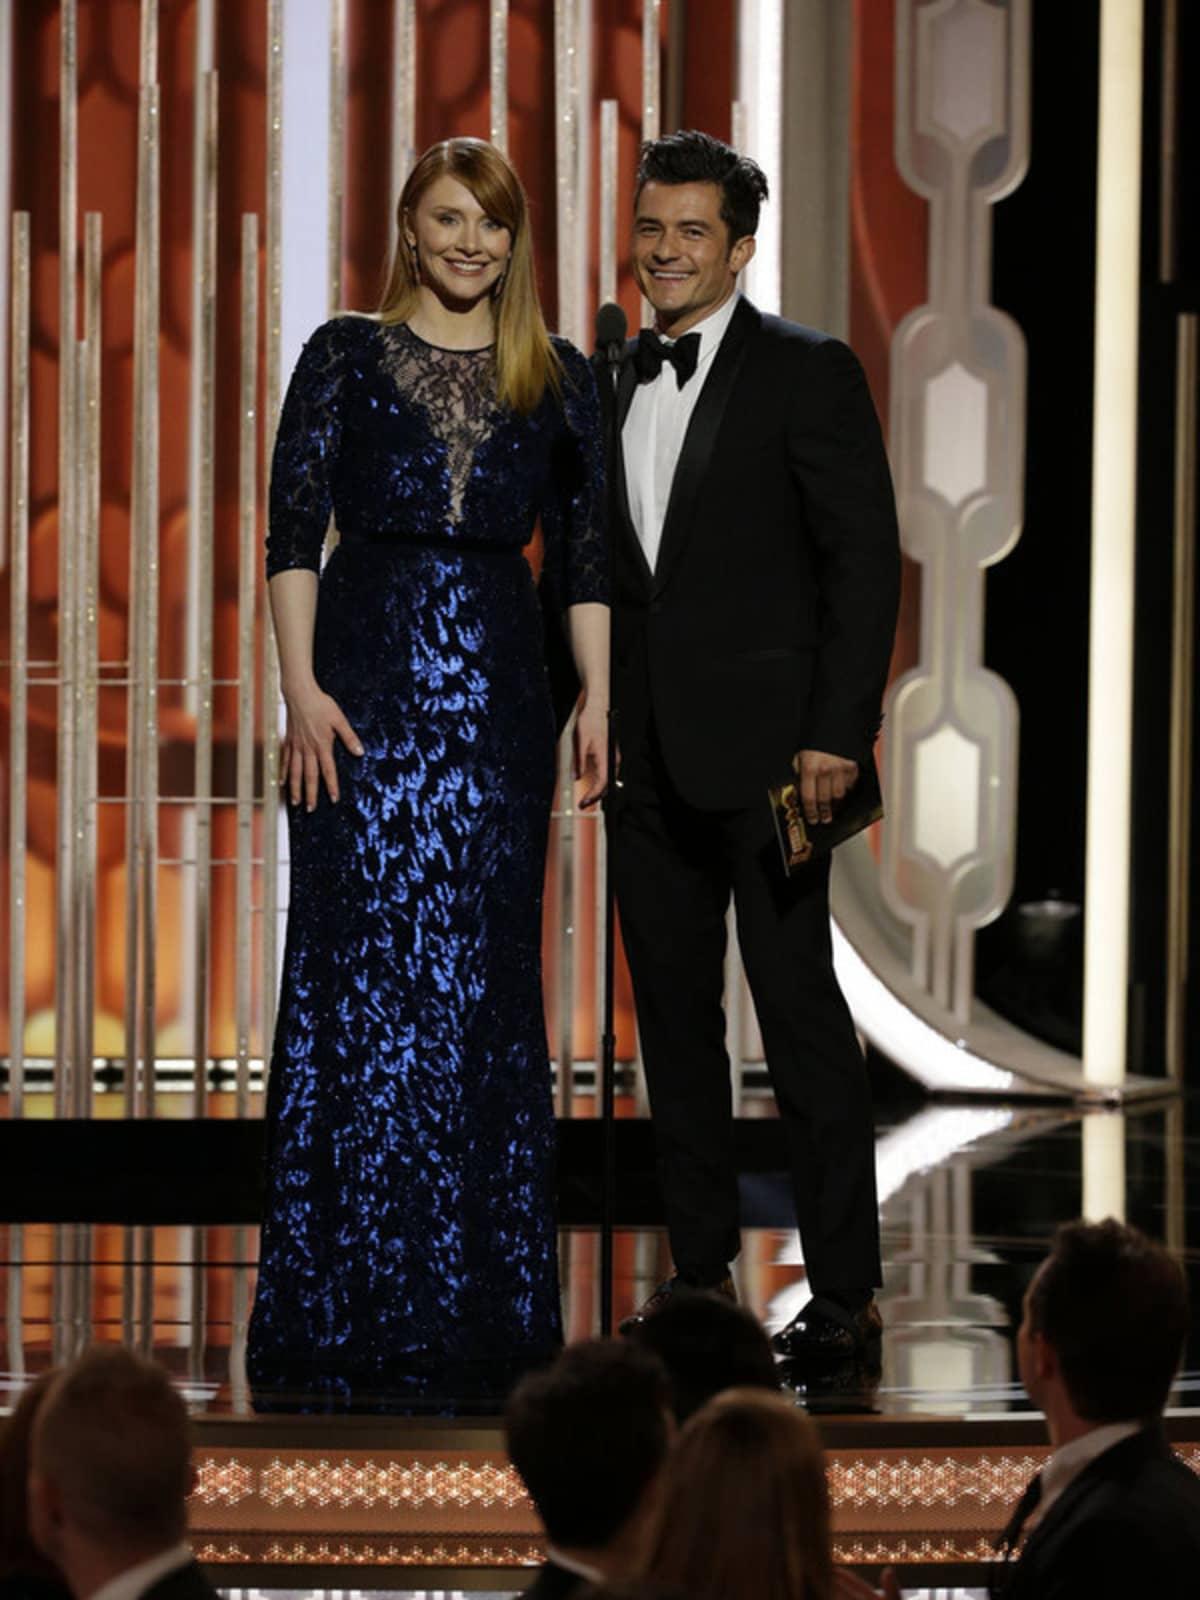 Dallas Bryce Howard at Golden Globe Awards